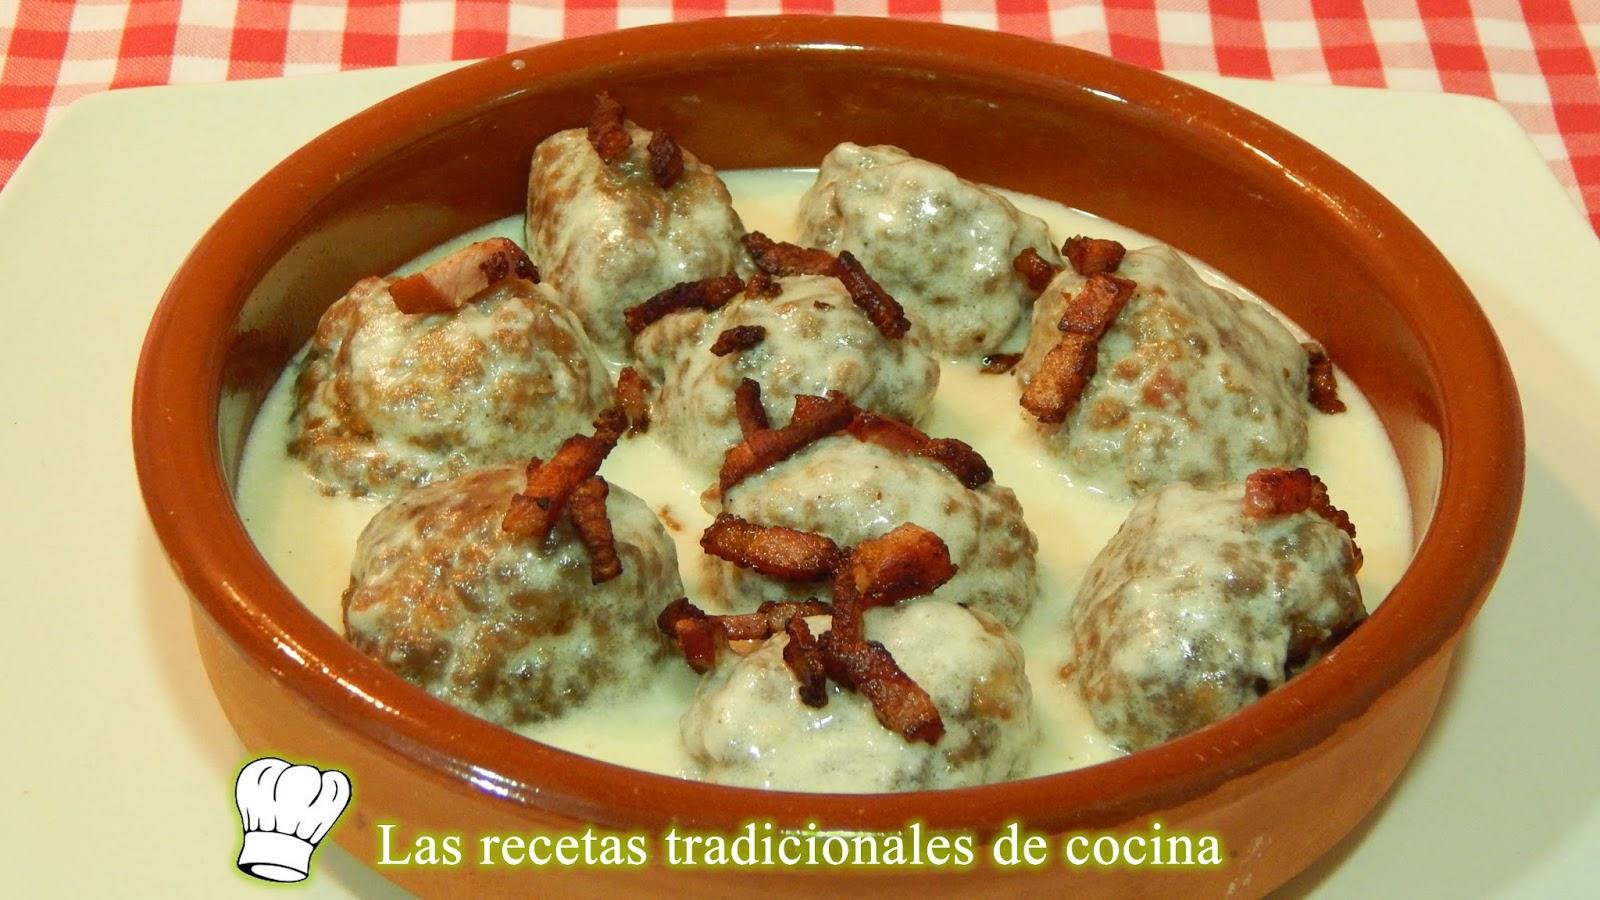 Receta f cil de alb ndigas en salsa de queso - Albondigas tradicionales ...